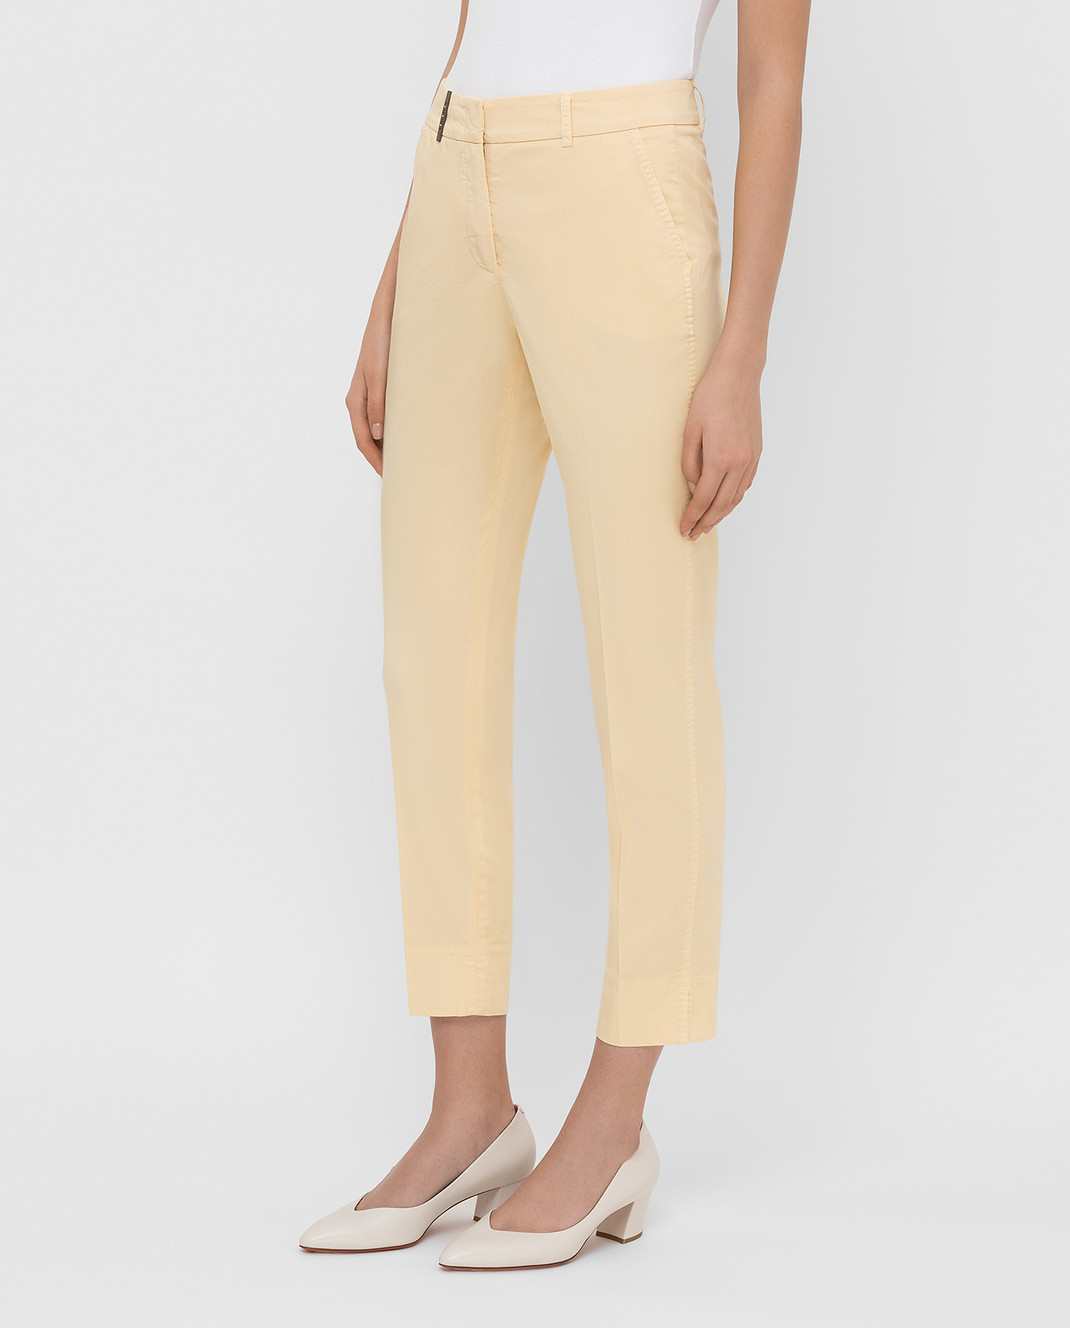 Peserico Светло-желтые брюки P04718T402477 изображение 3